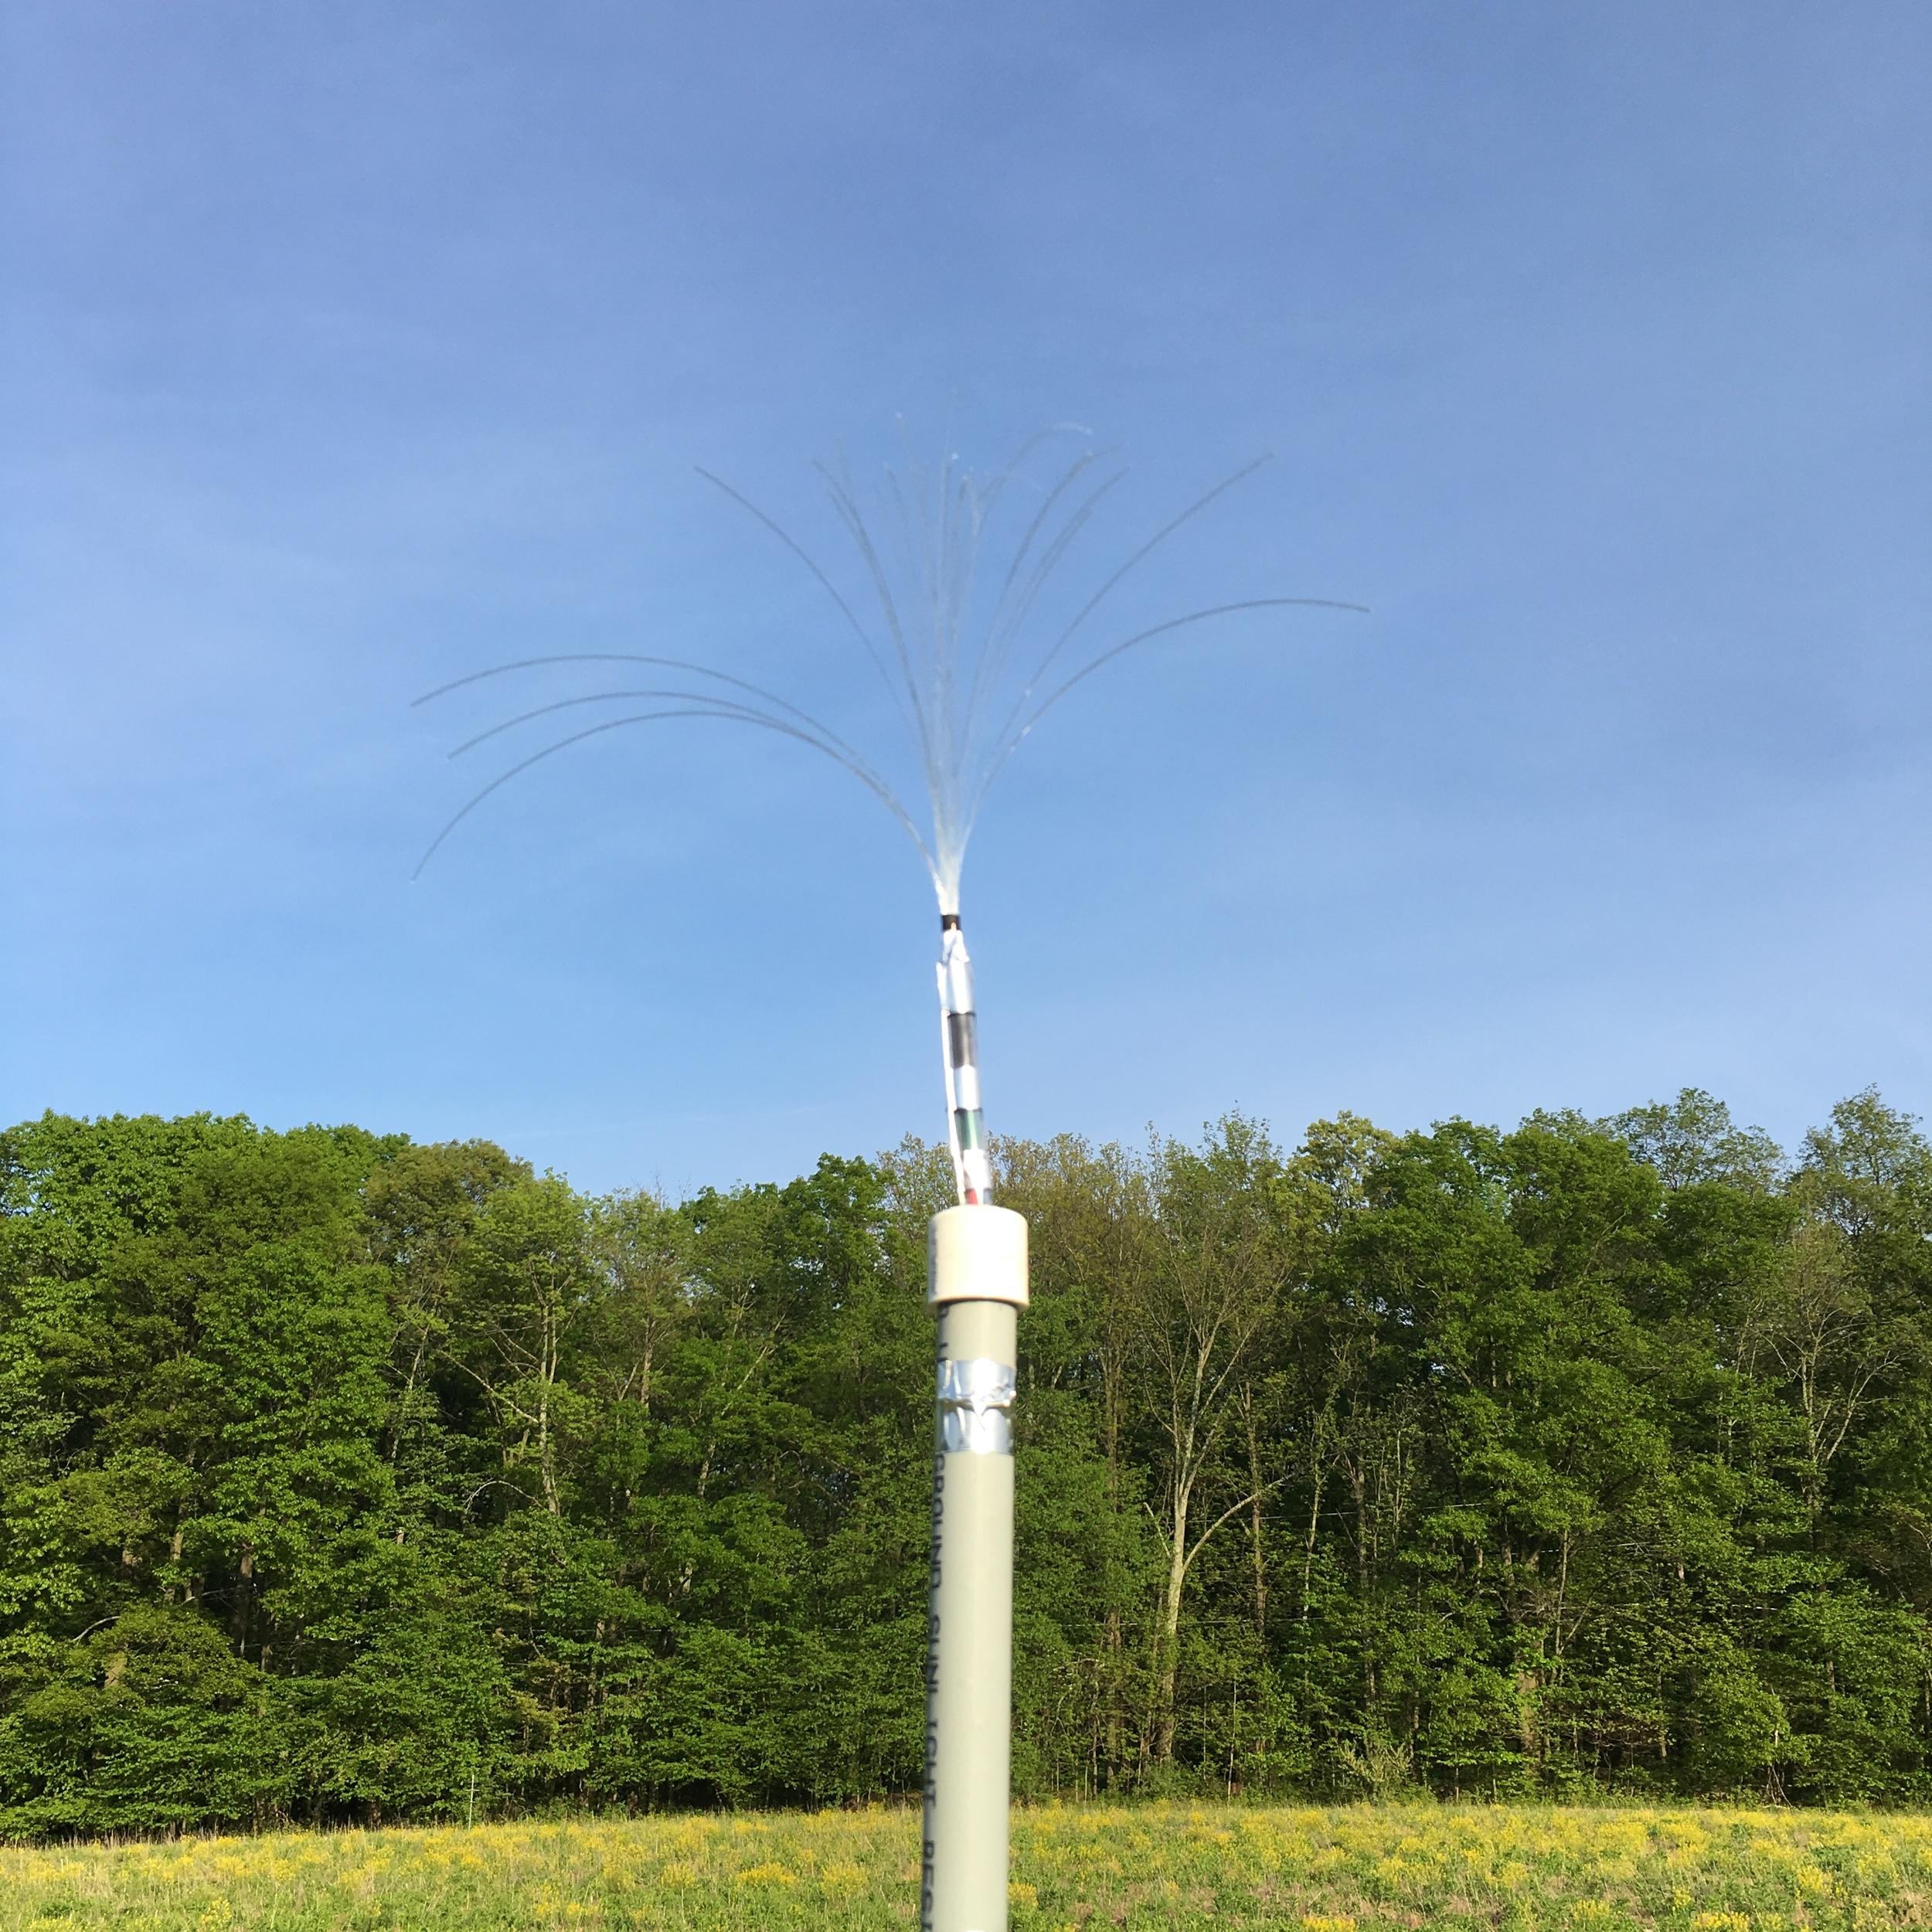 Earth-battery-powered, fiber-optic 'corn silk.'